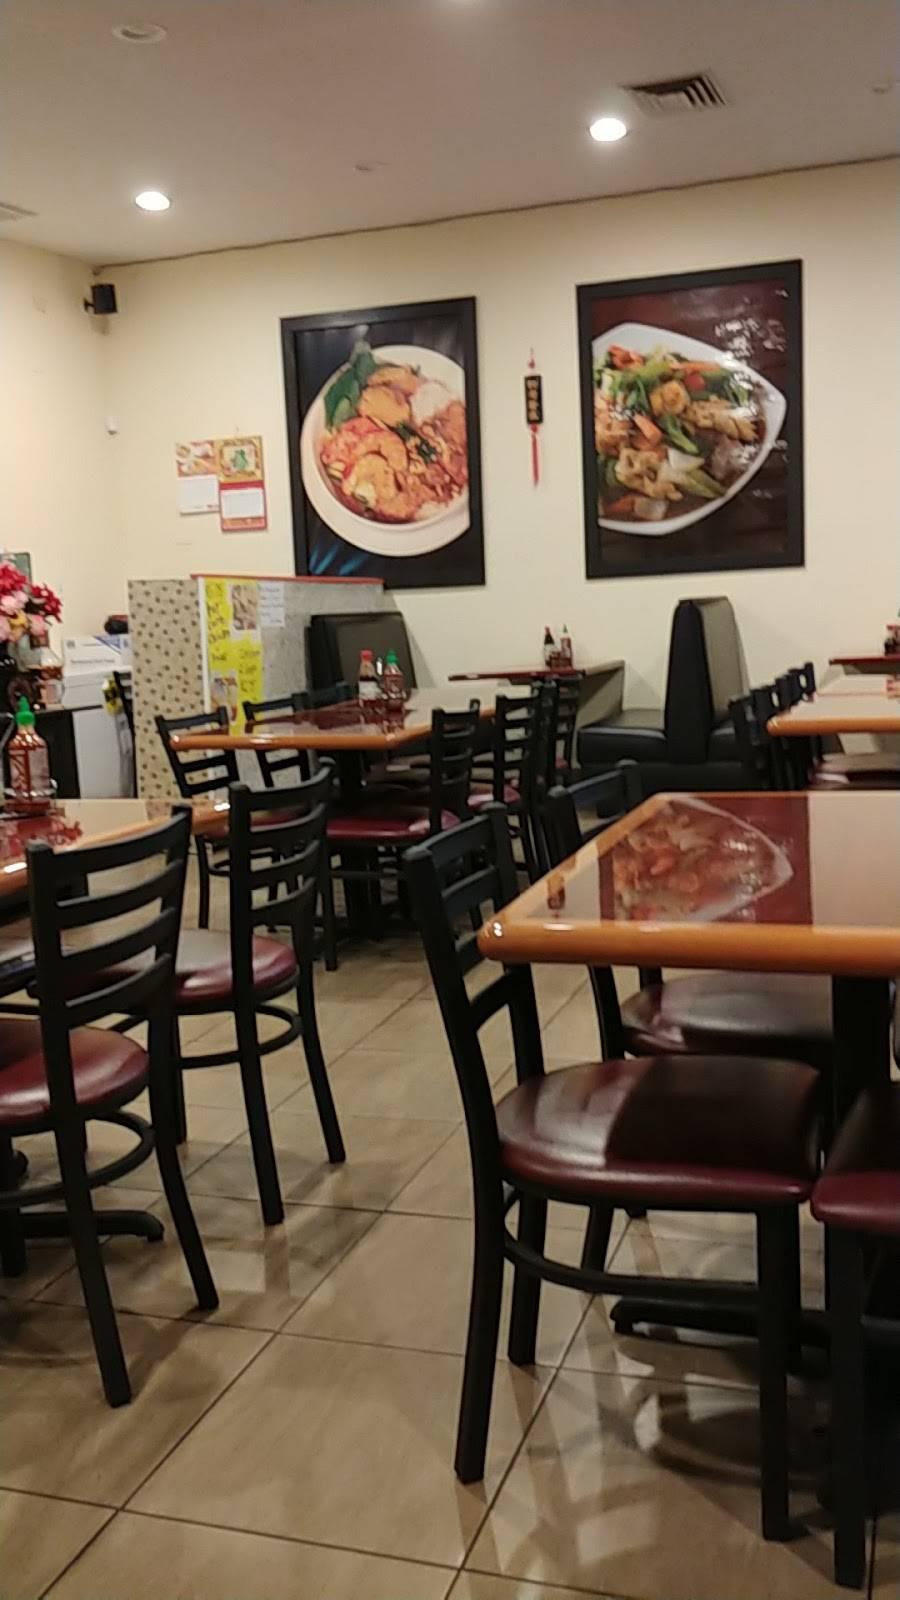 Pho Ly | restaurant | 634 E Whittier Blvd, La Habra, CA 90631, USA | 5622455798 OR +1 562-245-5798